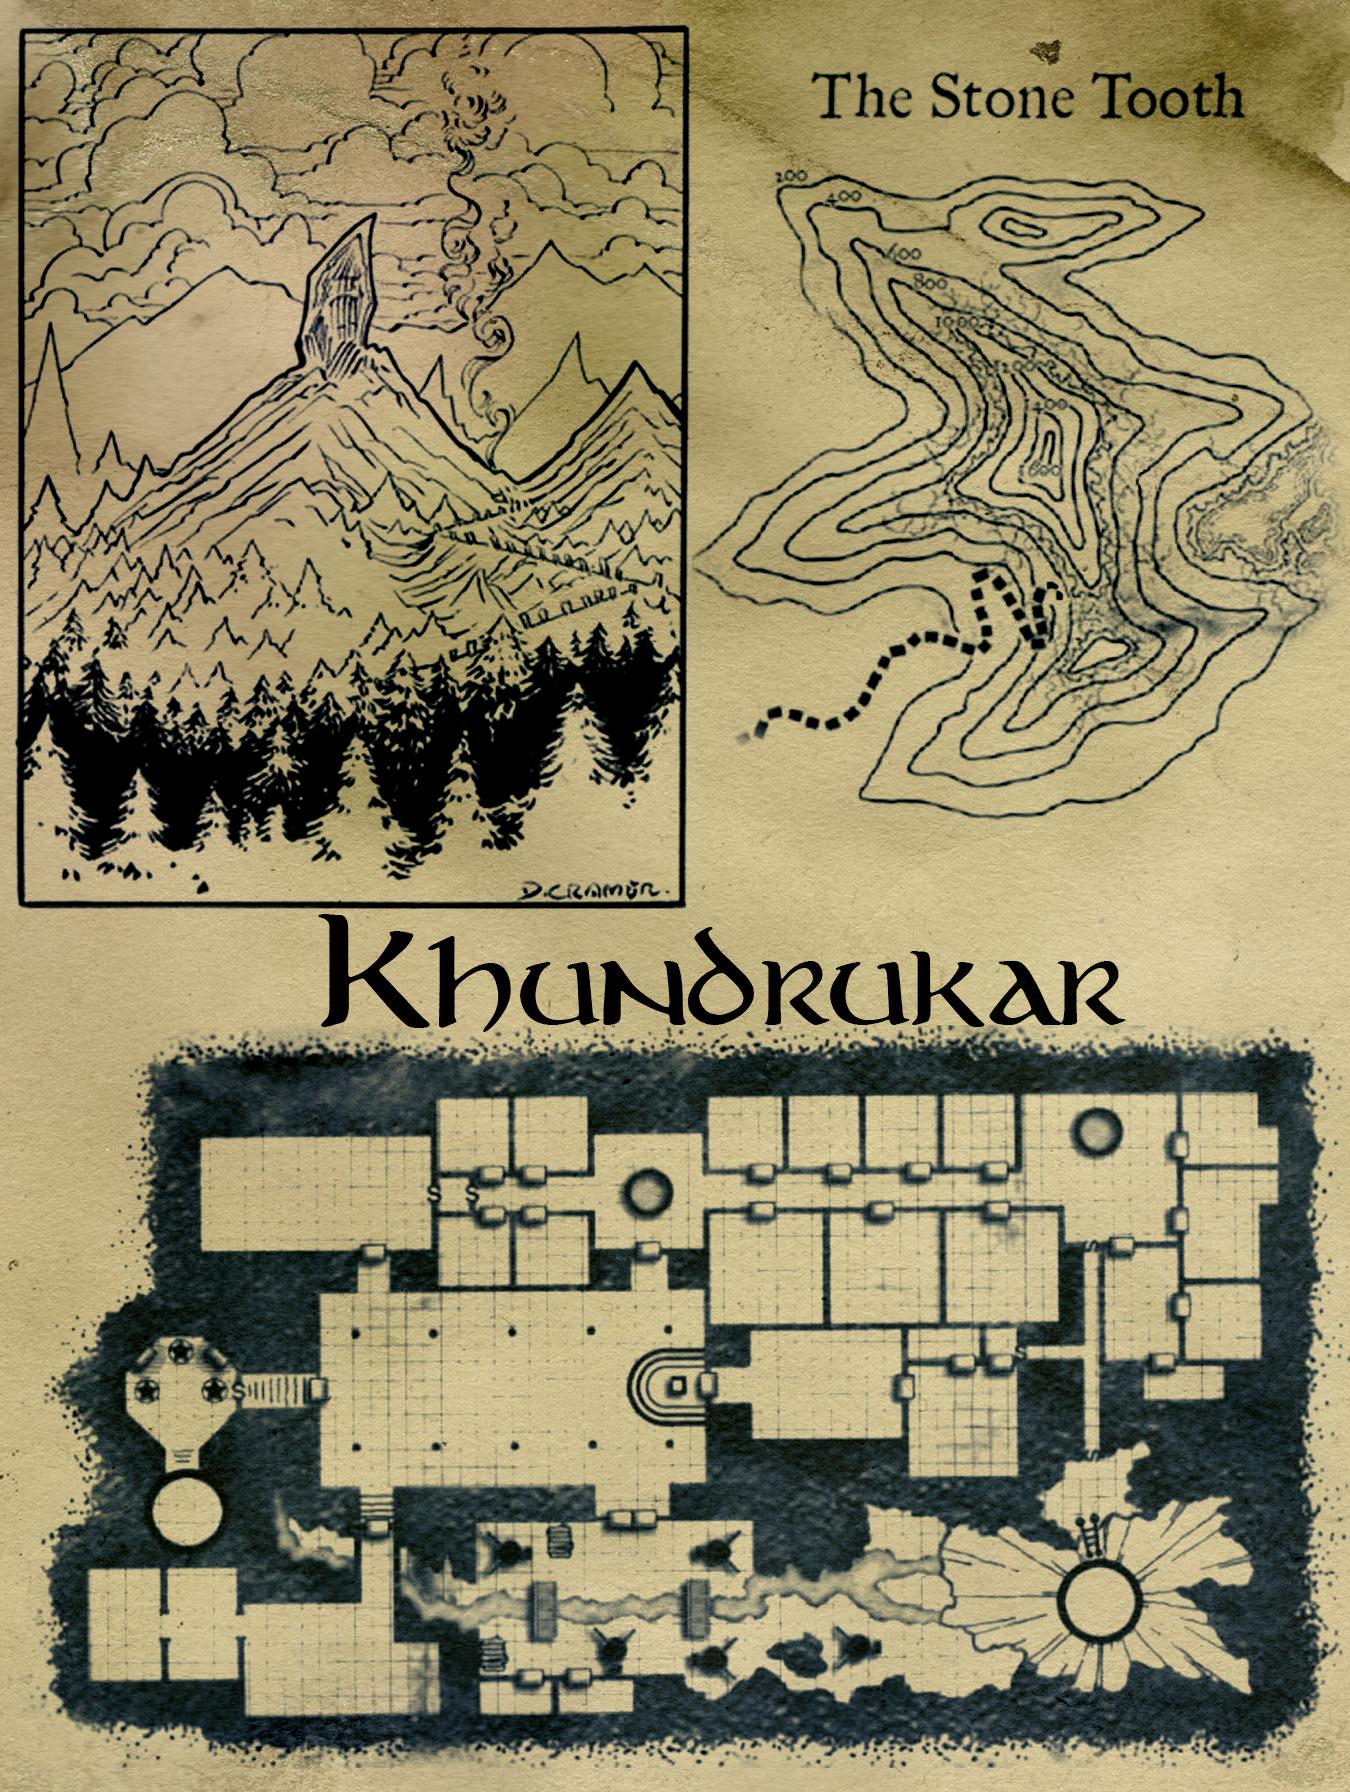 Khundrakar map